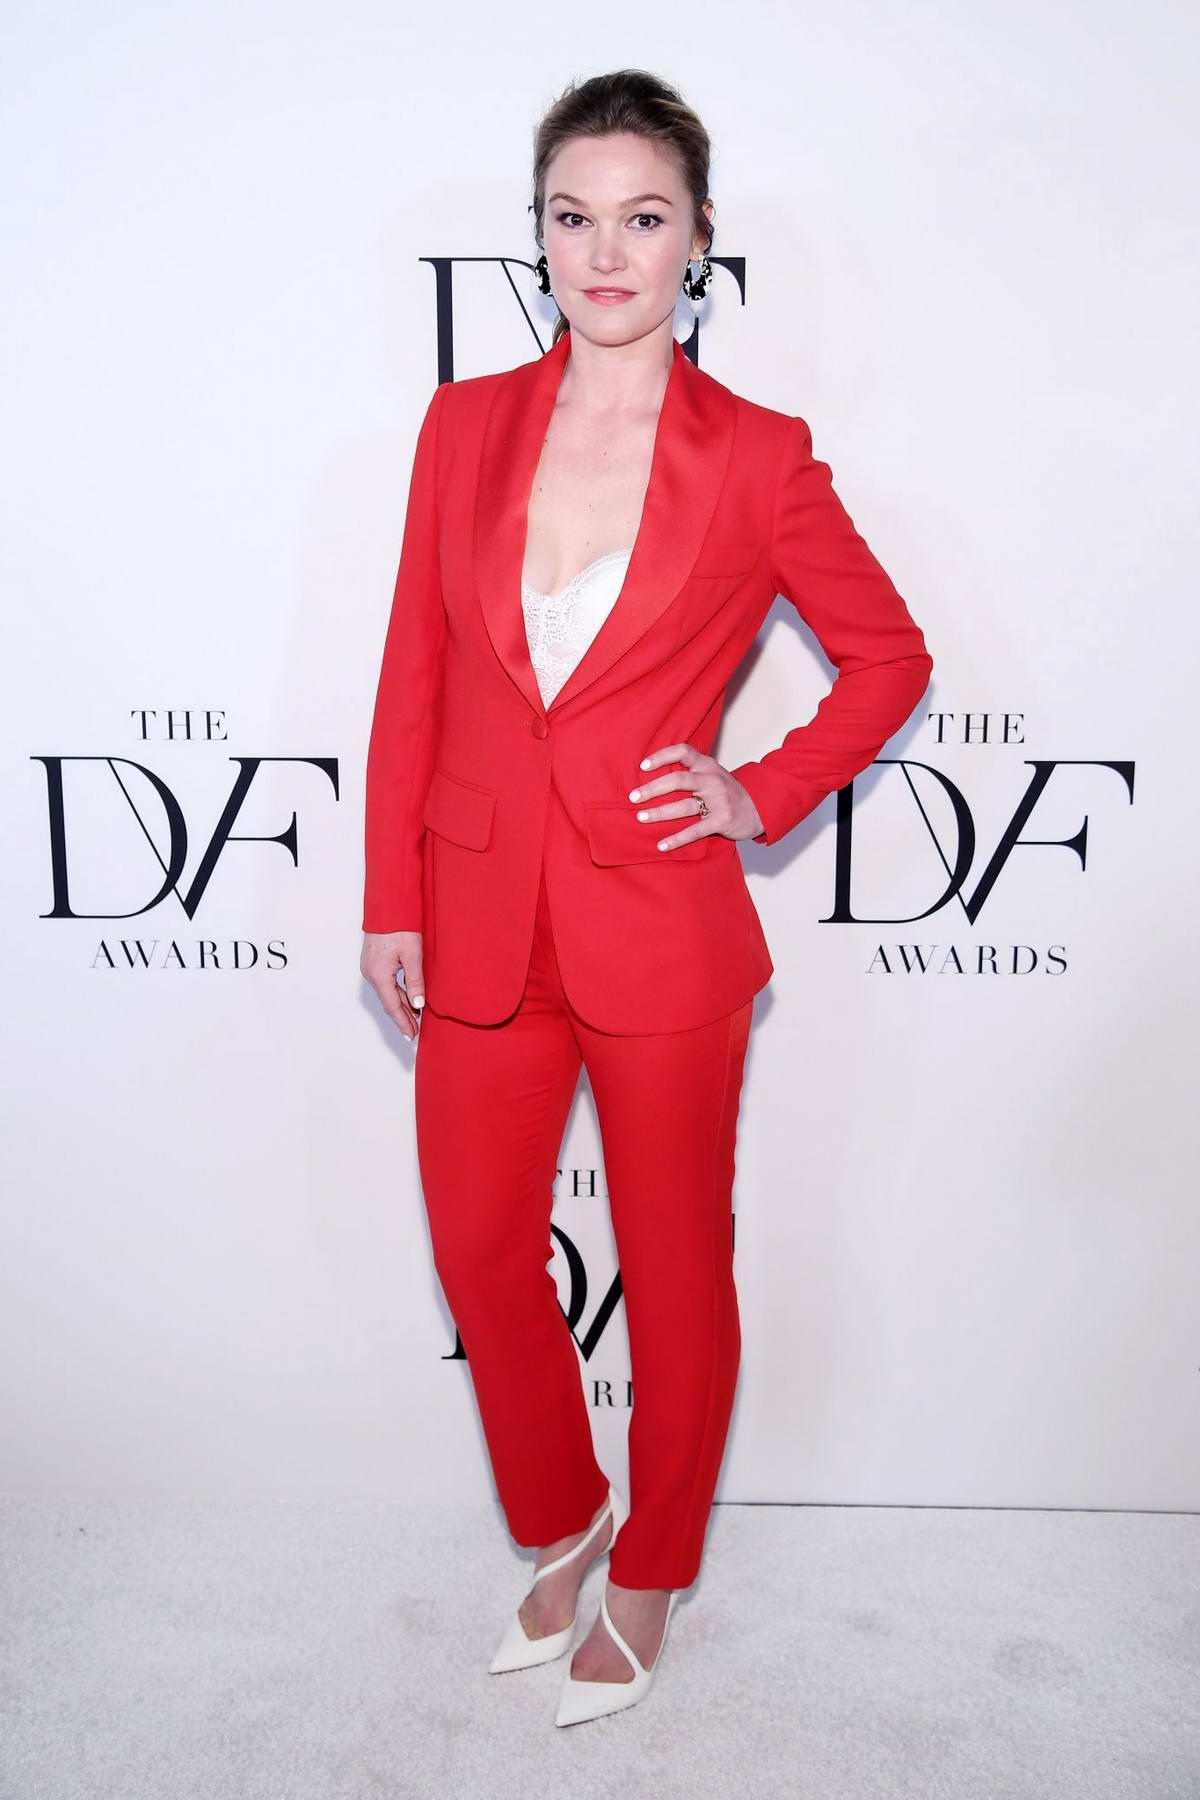 Julia Stiles attends 10th Annual DVF Awards in New York City